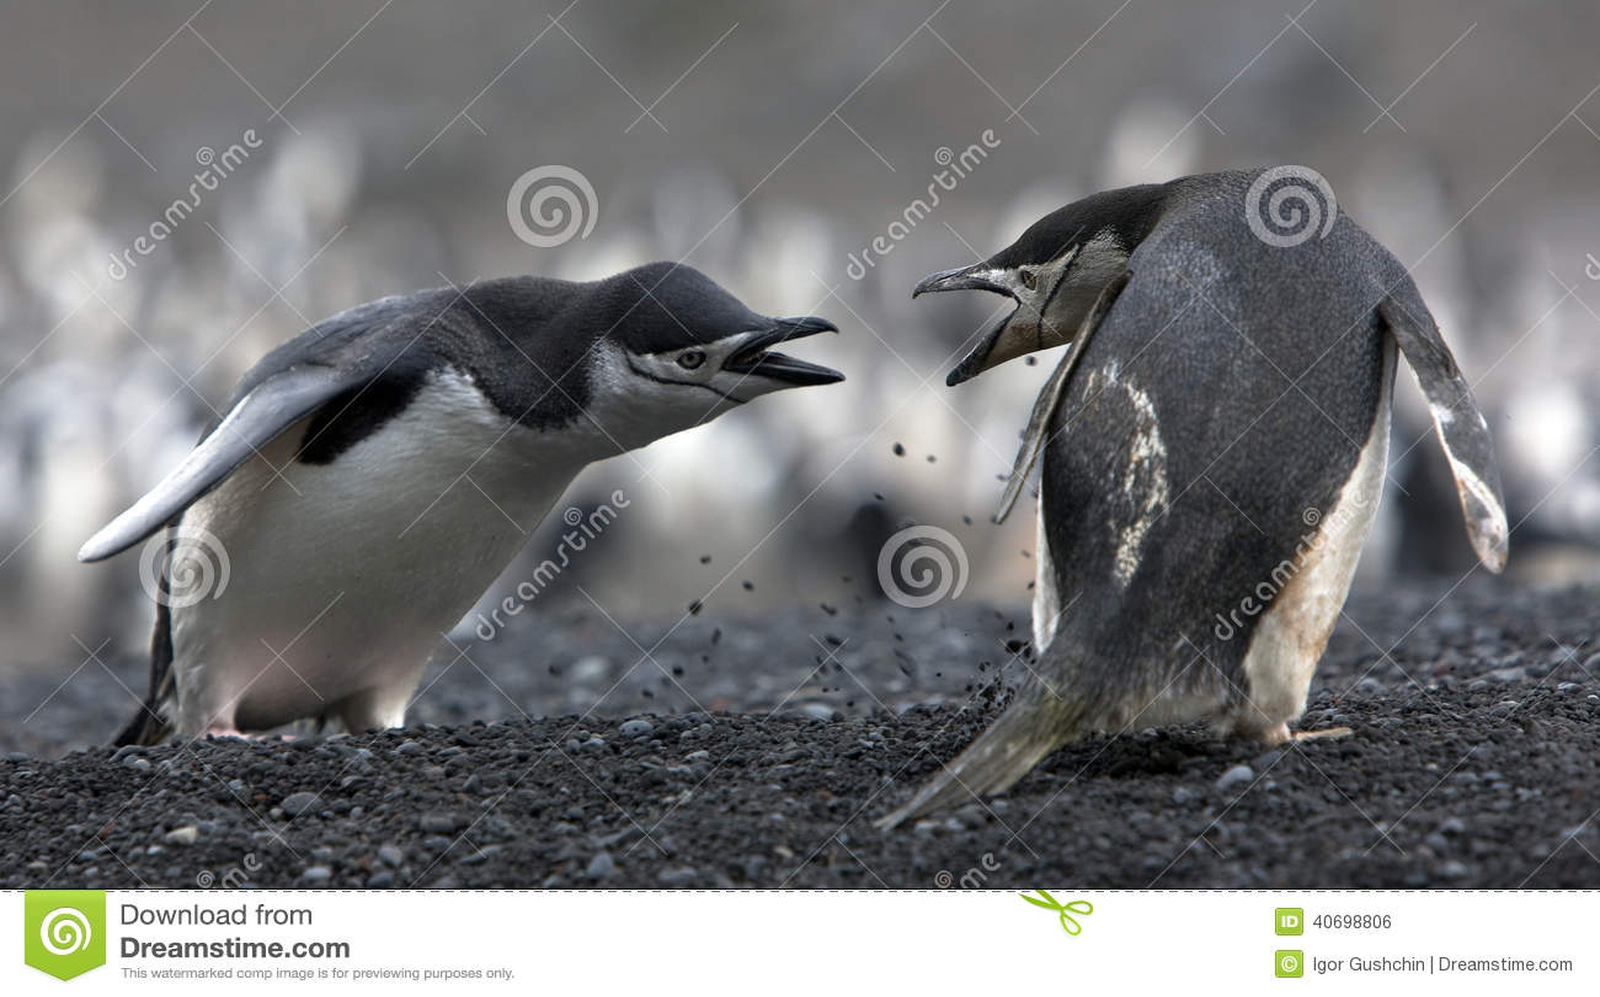 The conflict Antarctic penguins